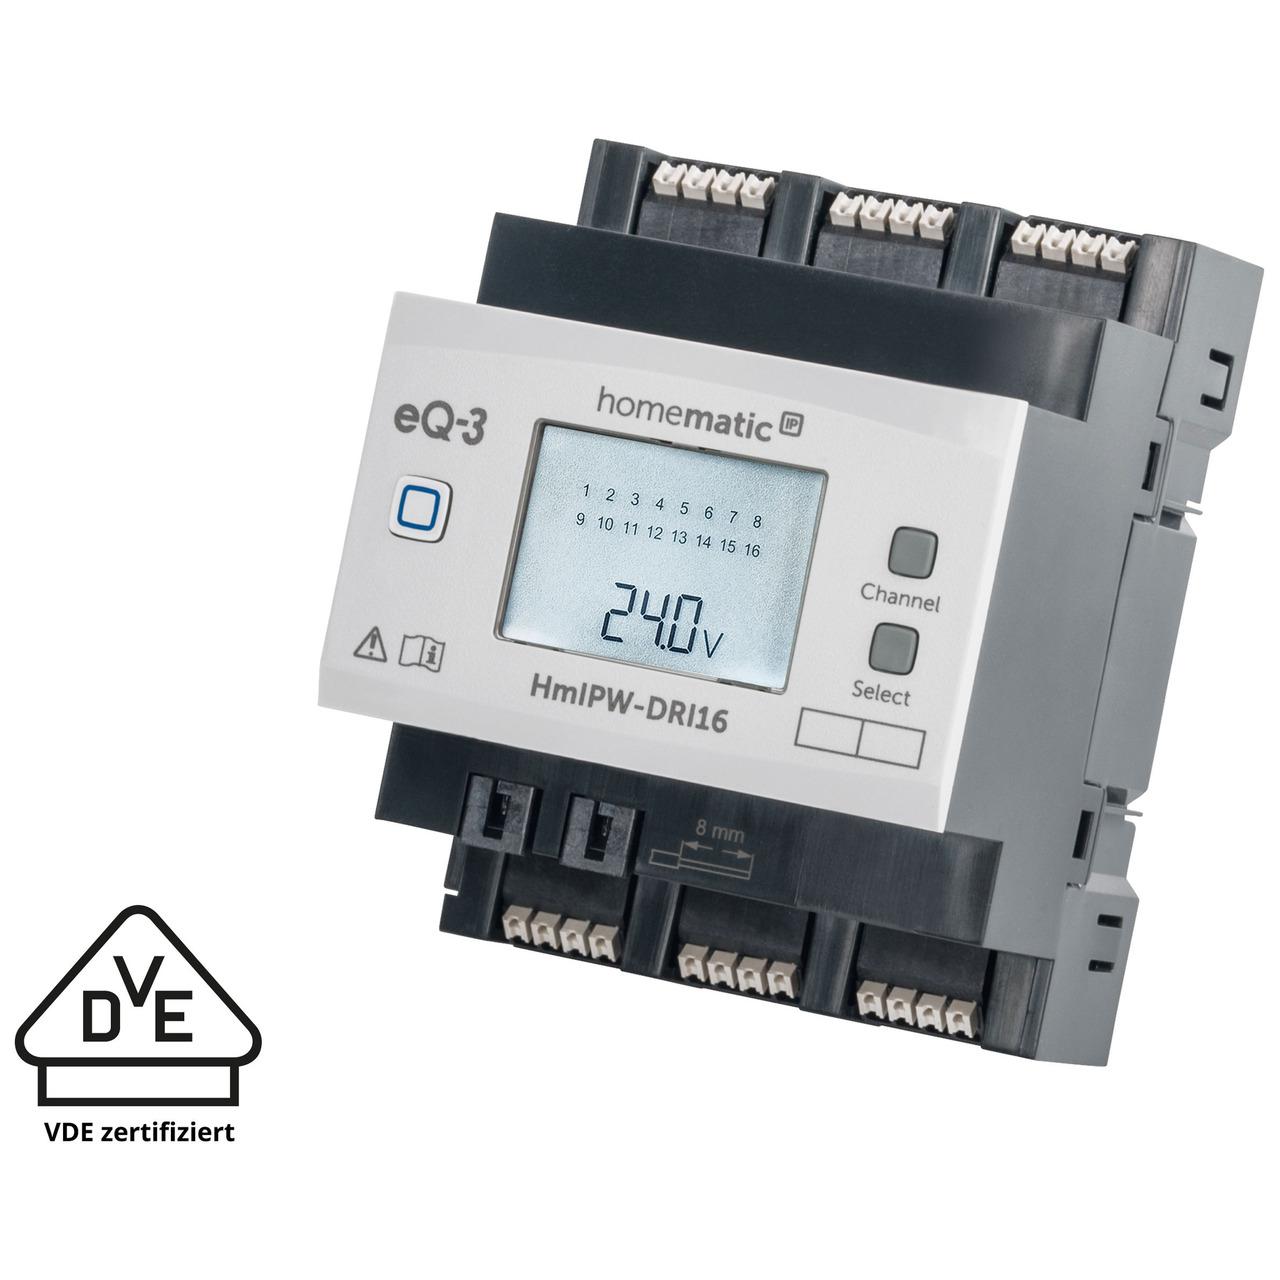 Homematic IP Wired Smart Home 16-fach-Eingangsmodul HmIPW-DRI16- VDE zertifiziert